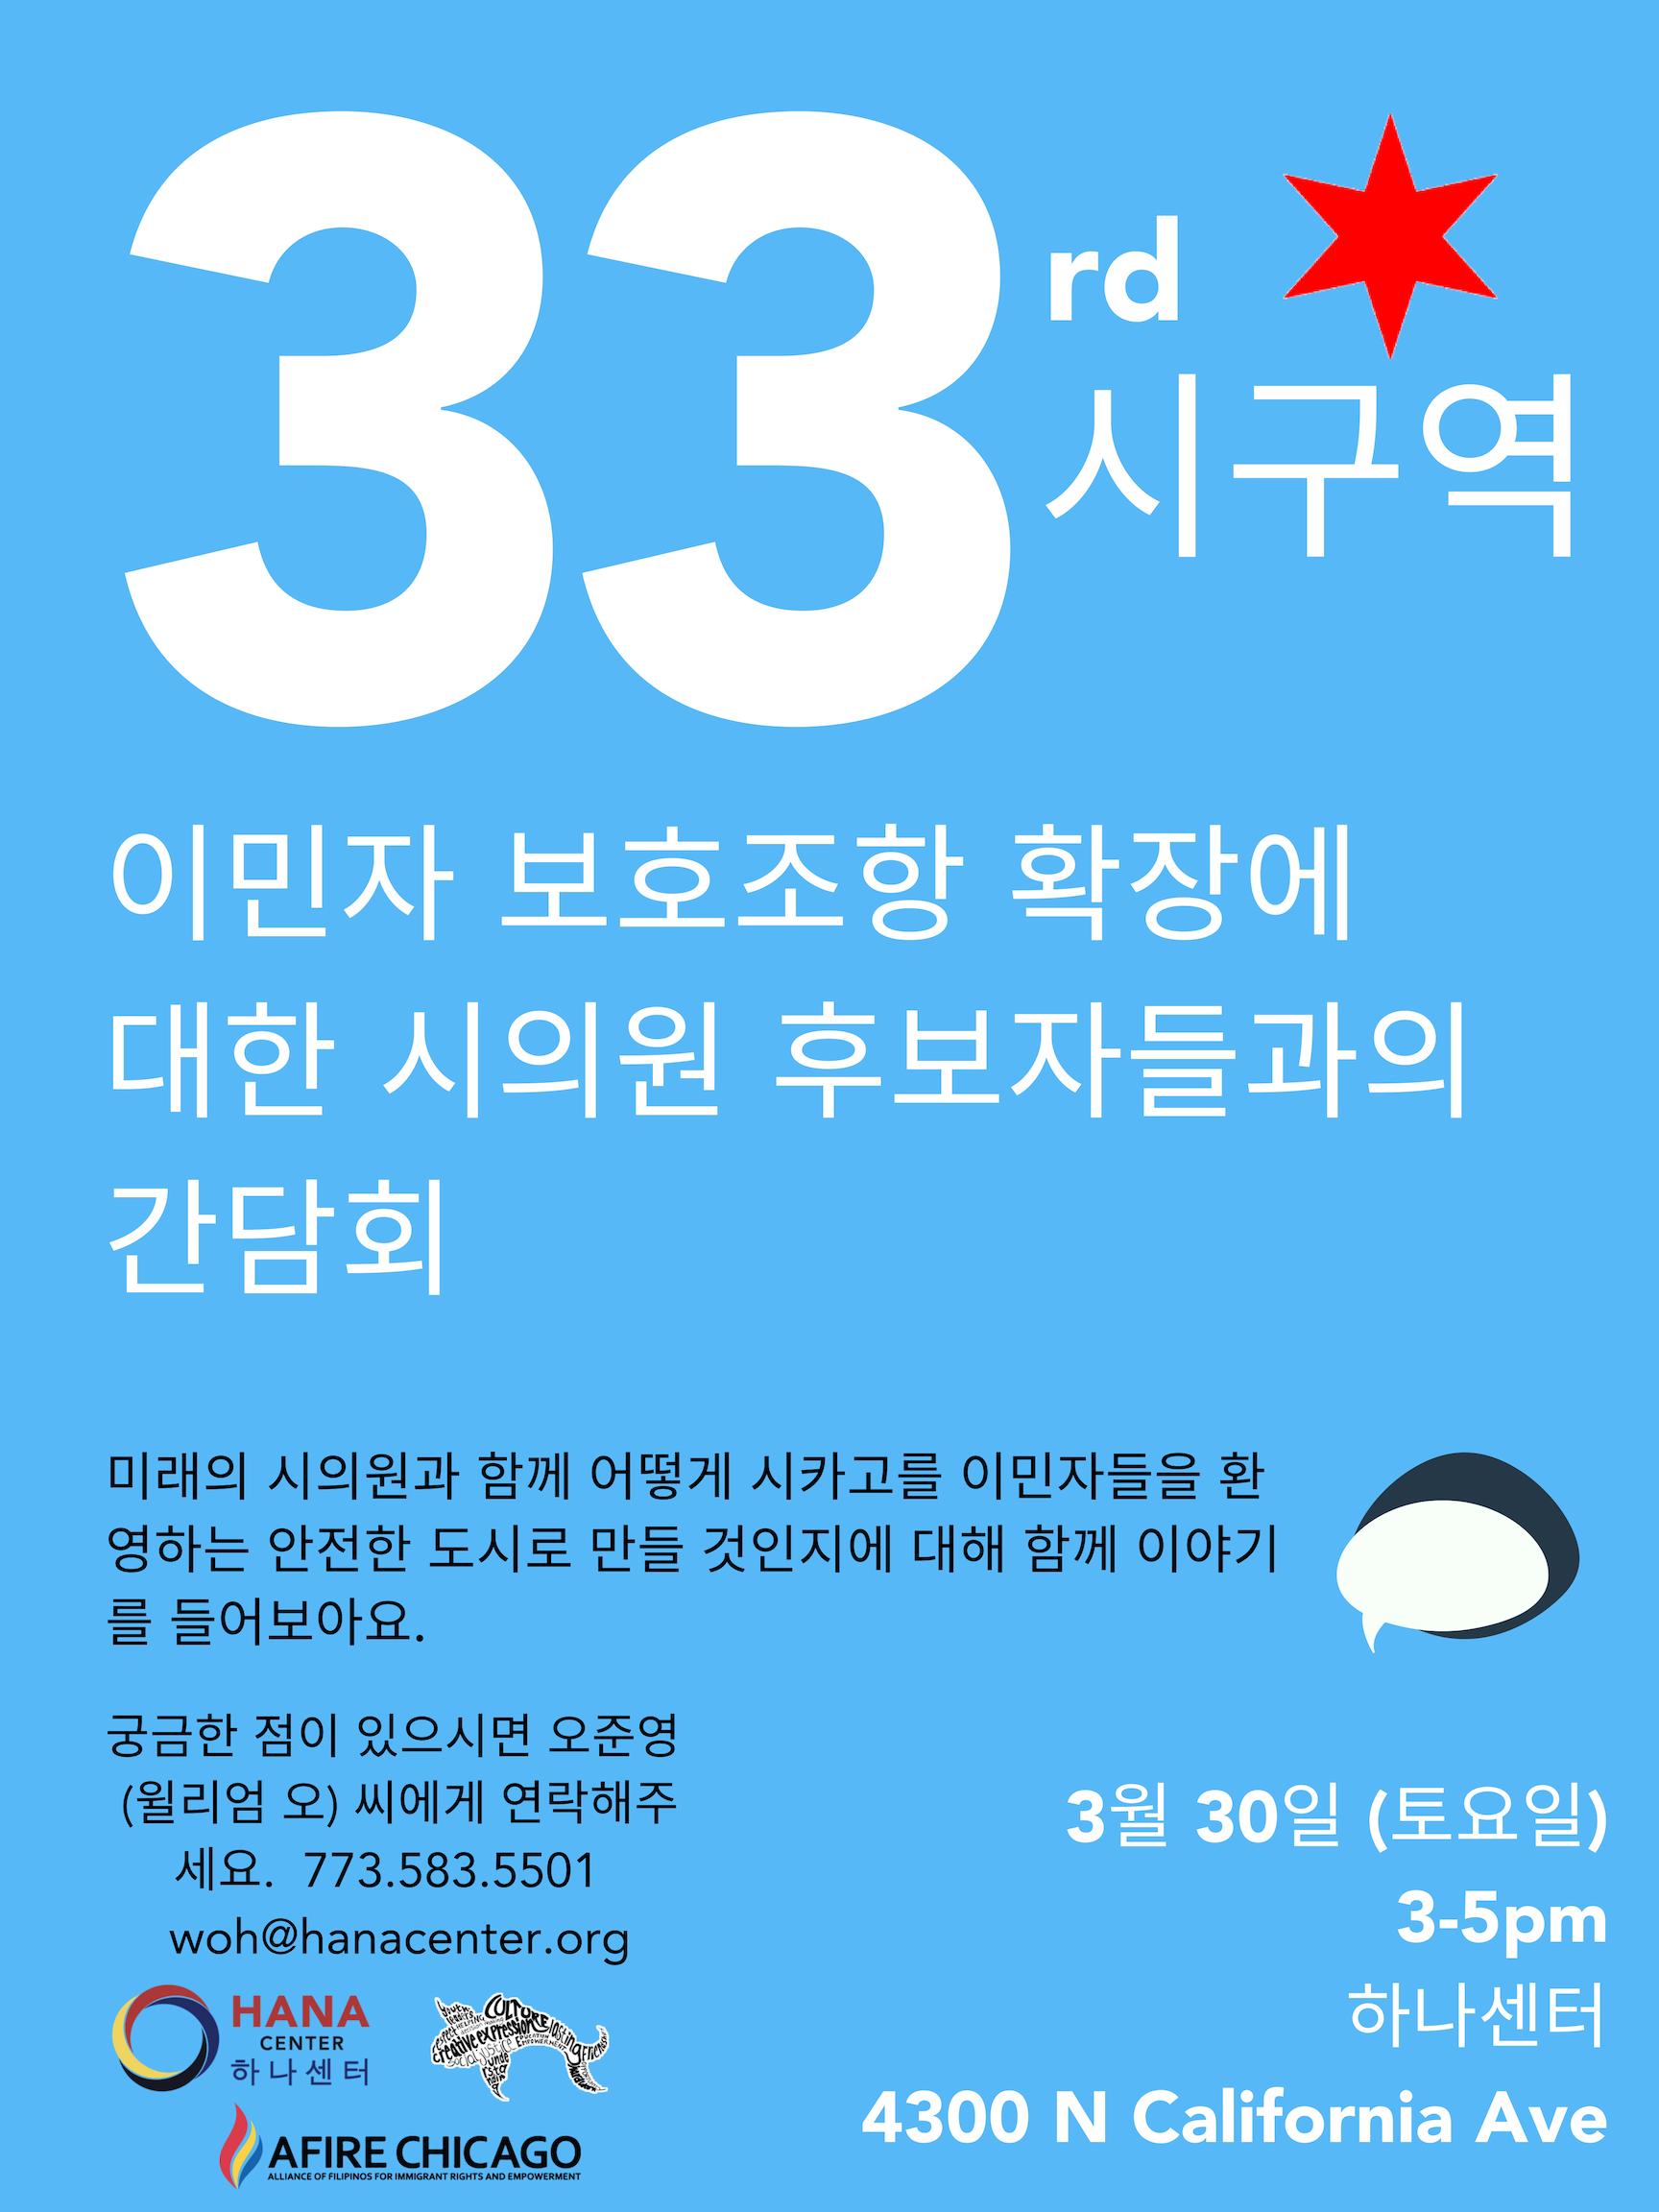 33rd Ward Community Forum Flyer_Korean.png